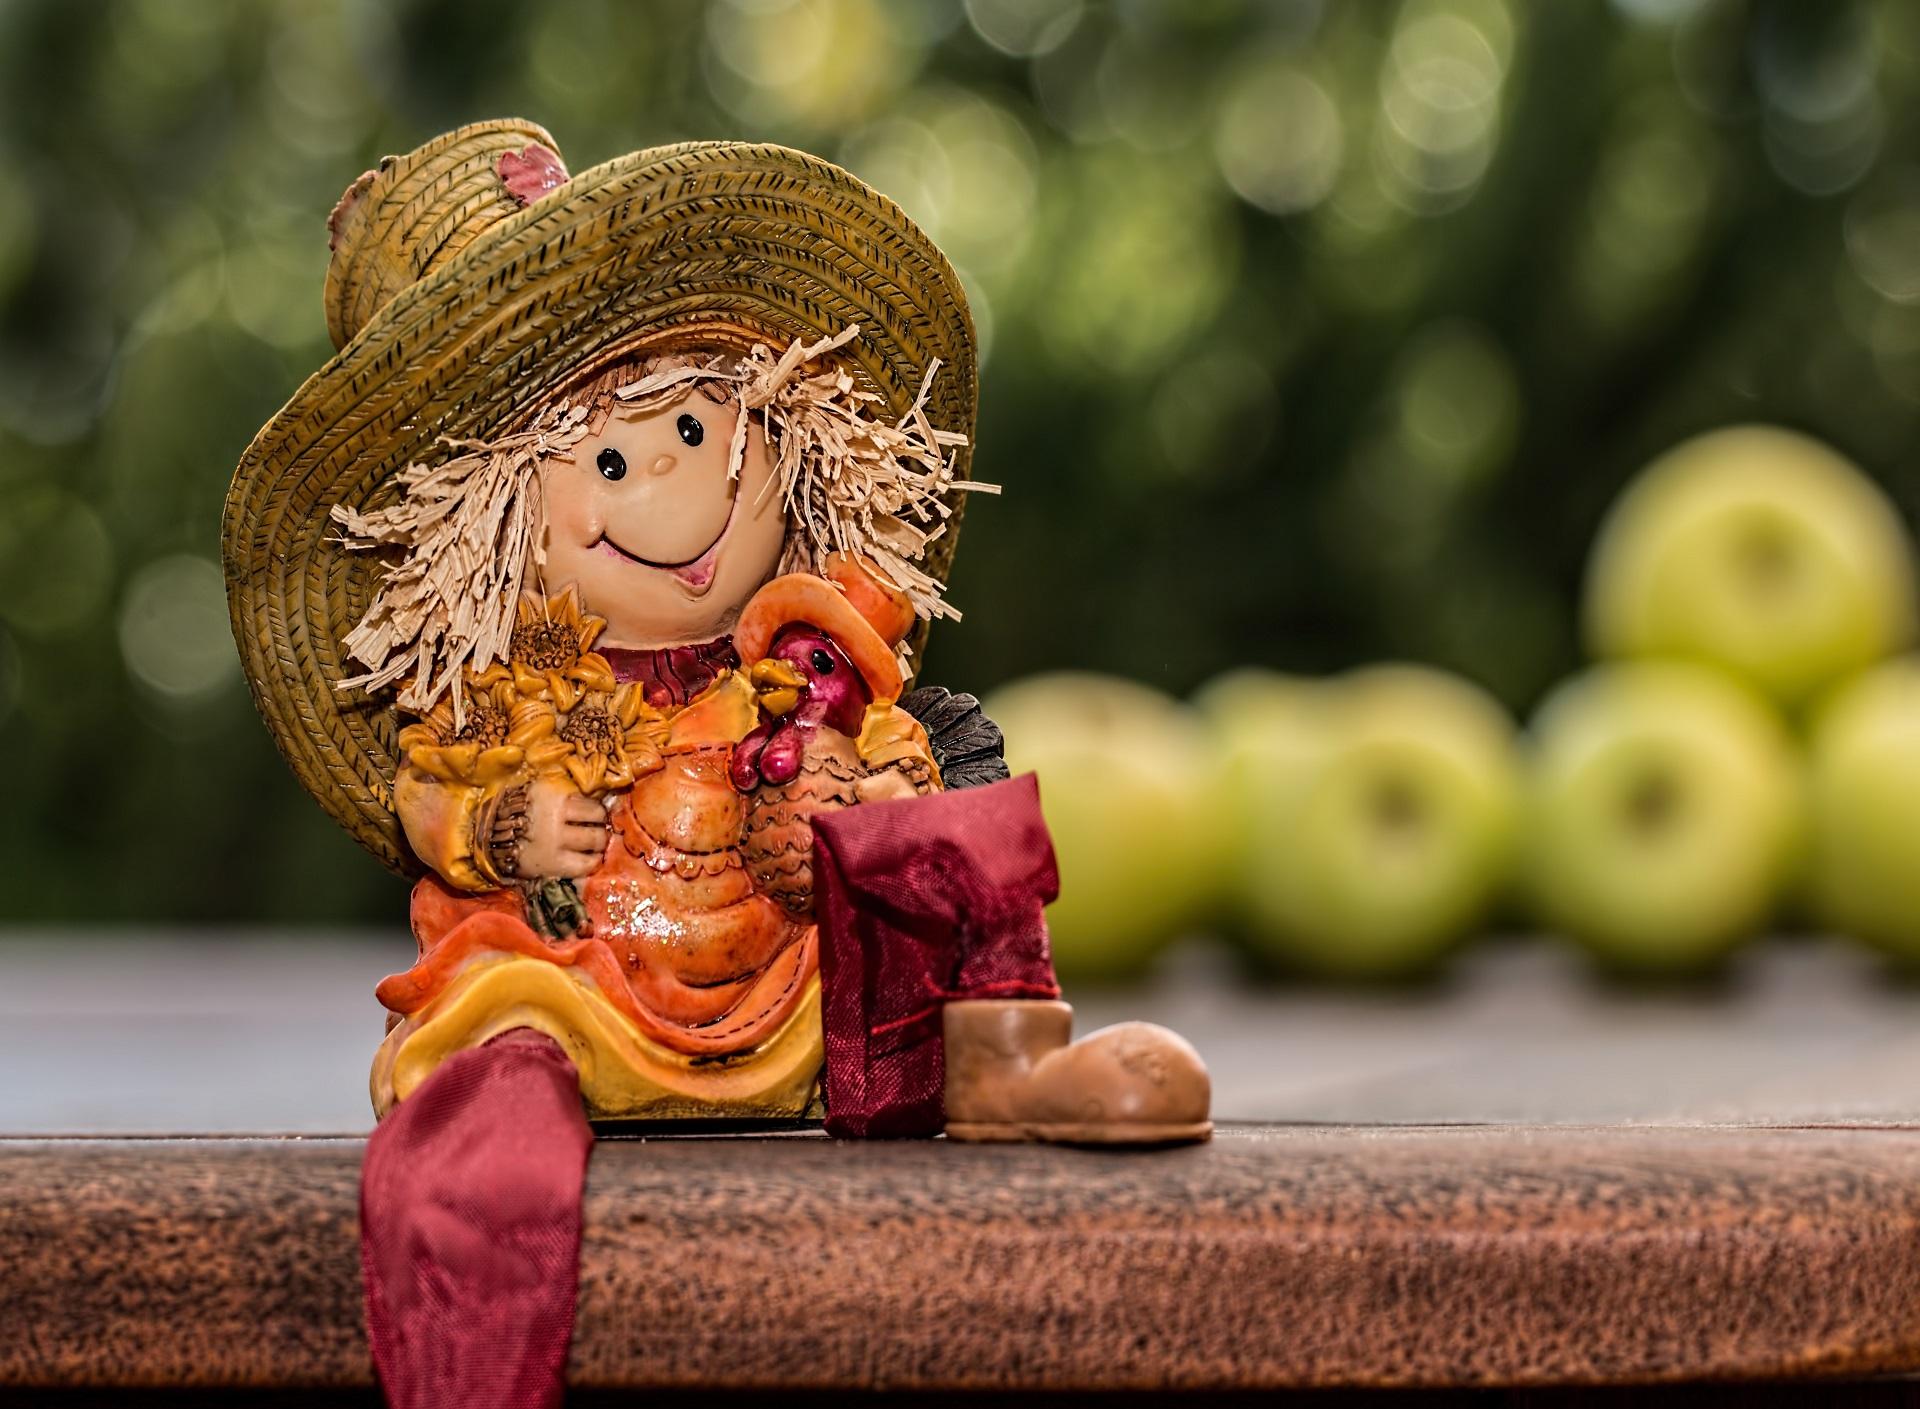 farm-girl-1509198